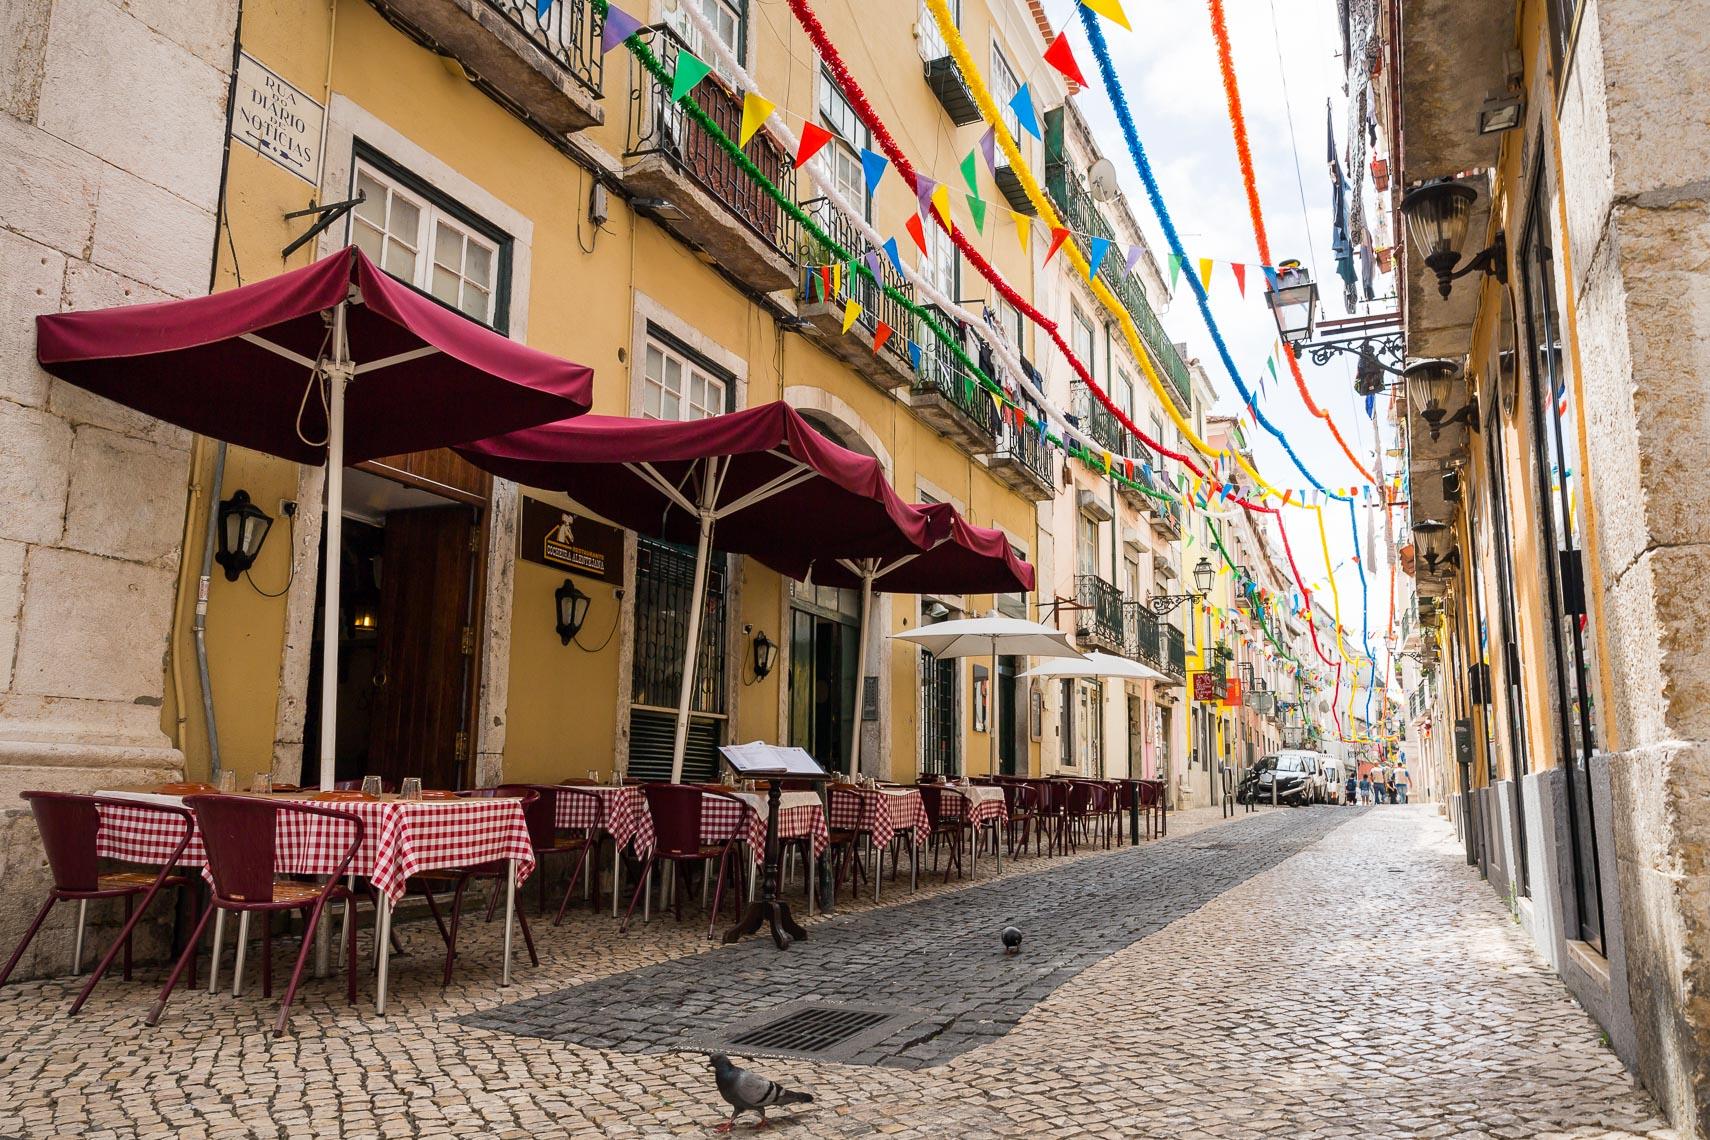 MR_150623_Portugal_0079.jpg